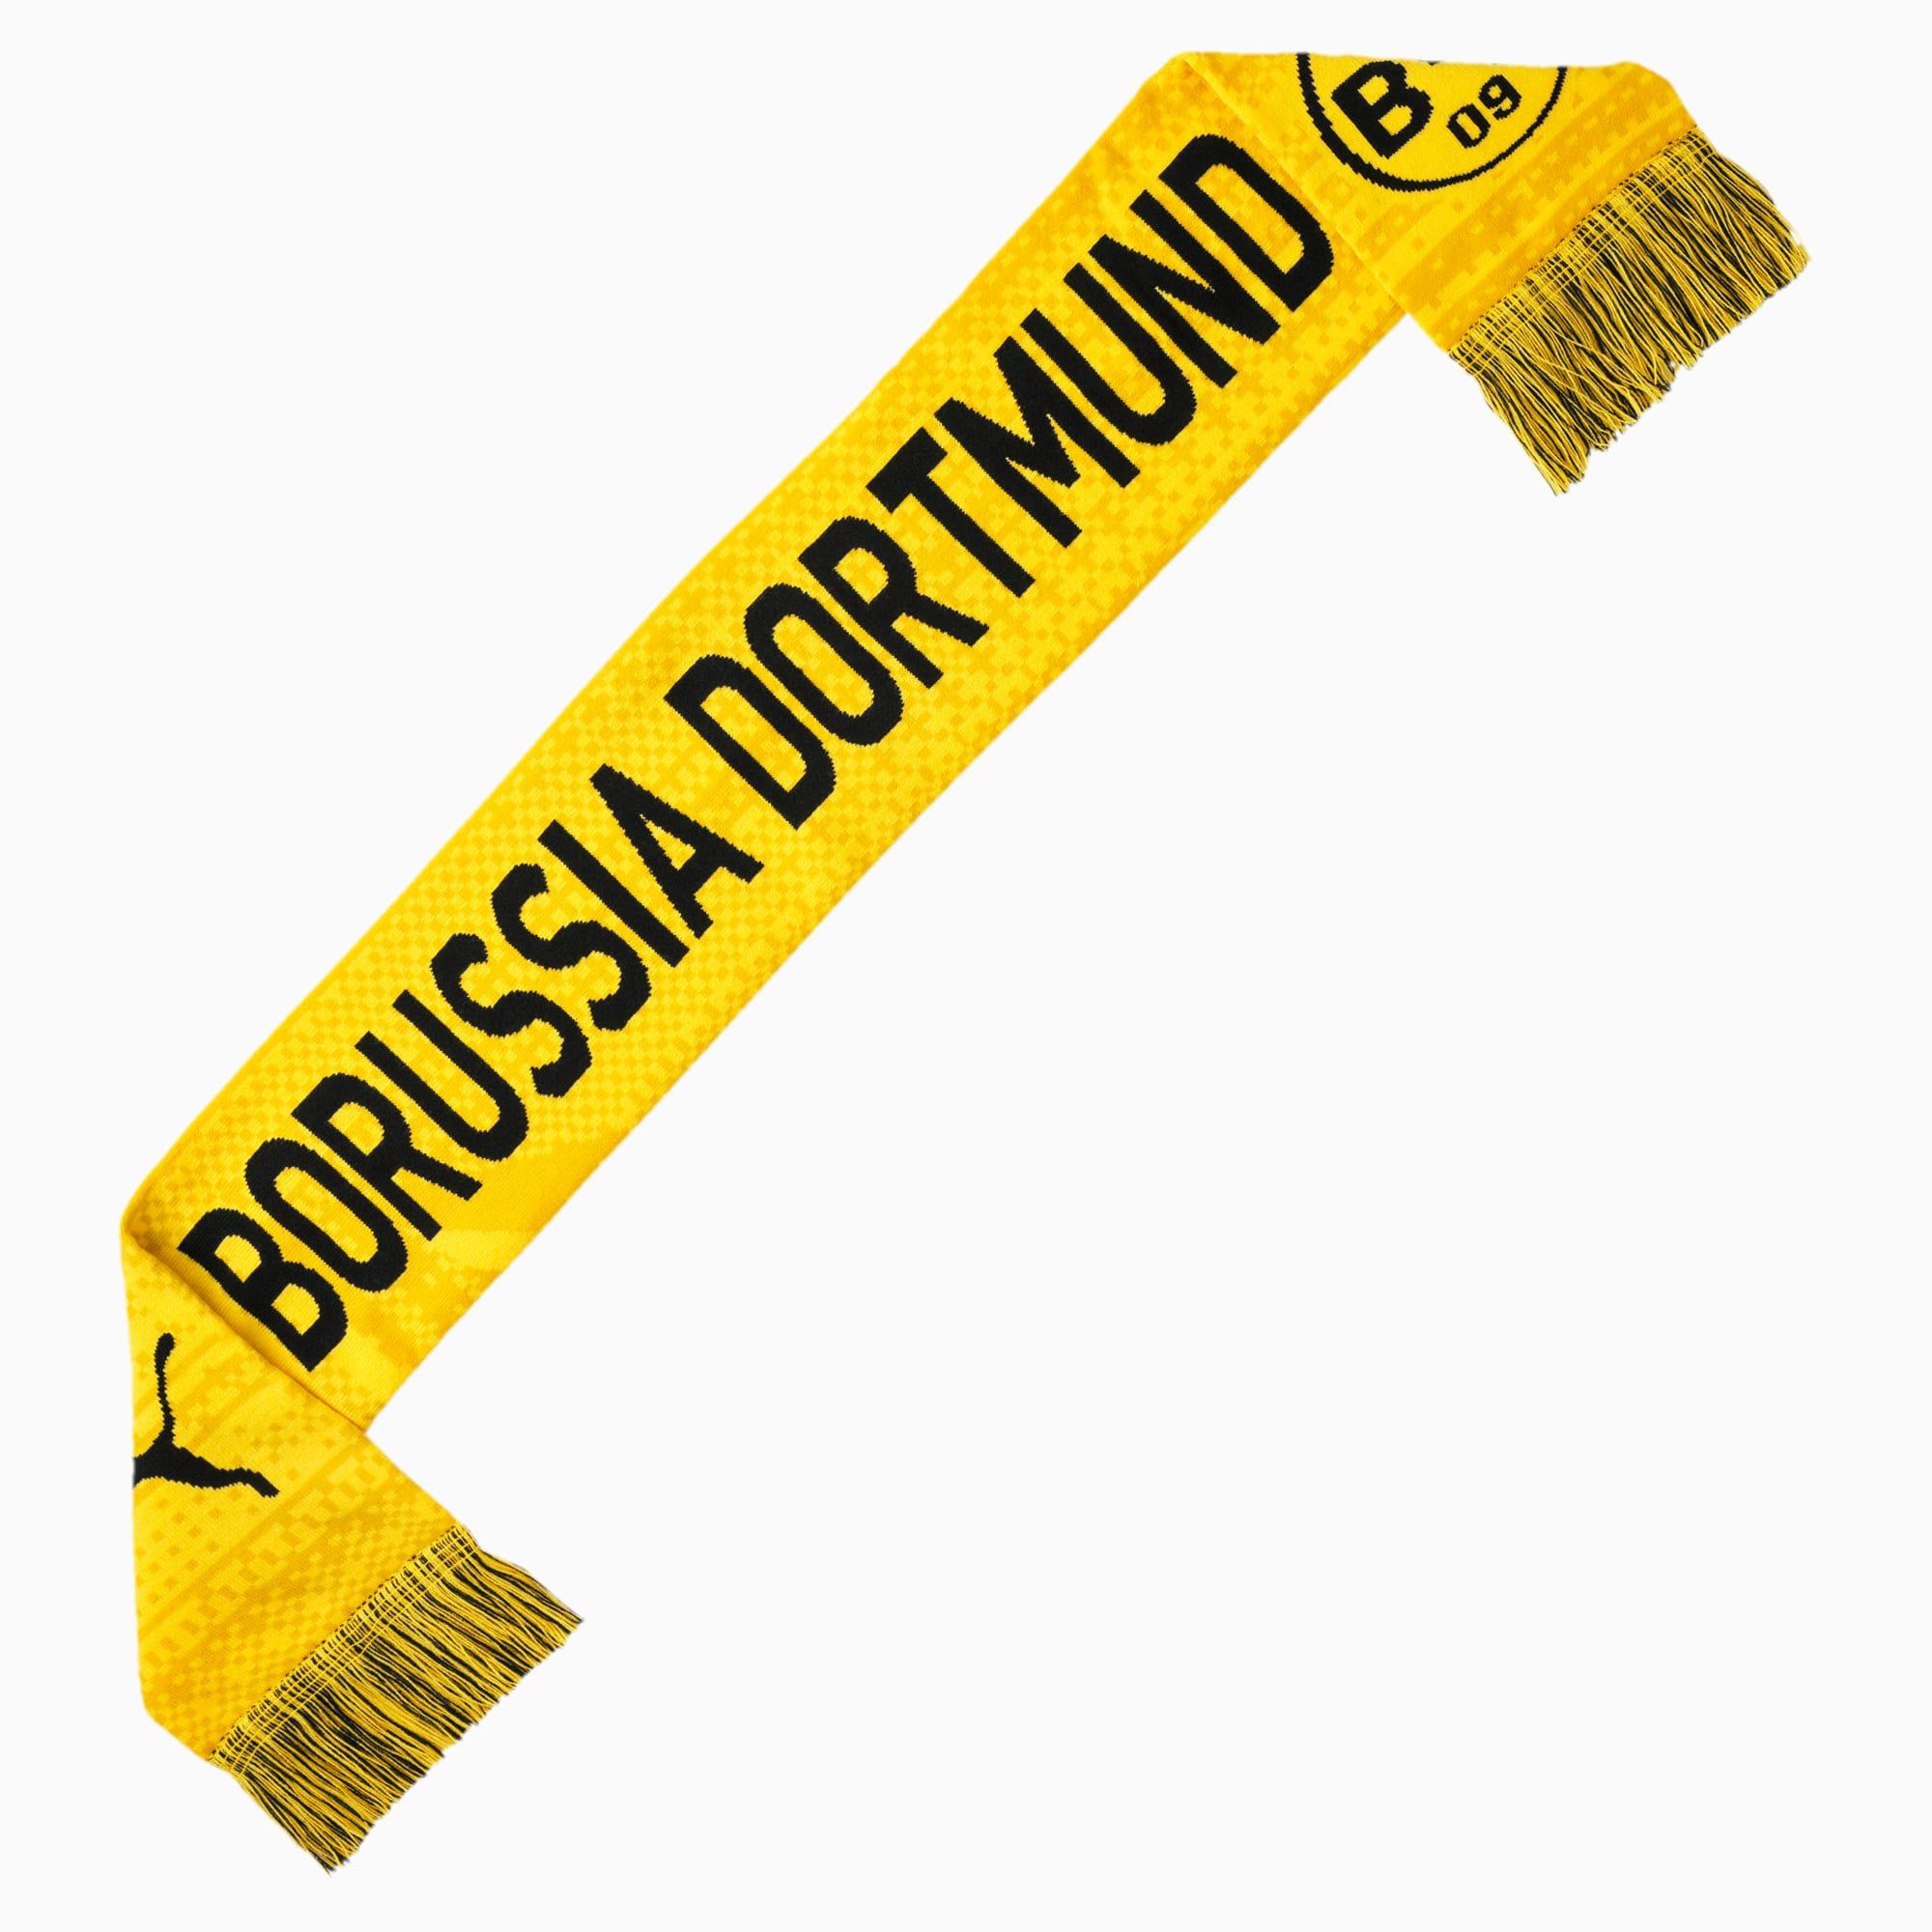 Écharpe bvb football culture, jaune/noir, vêtements